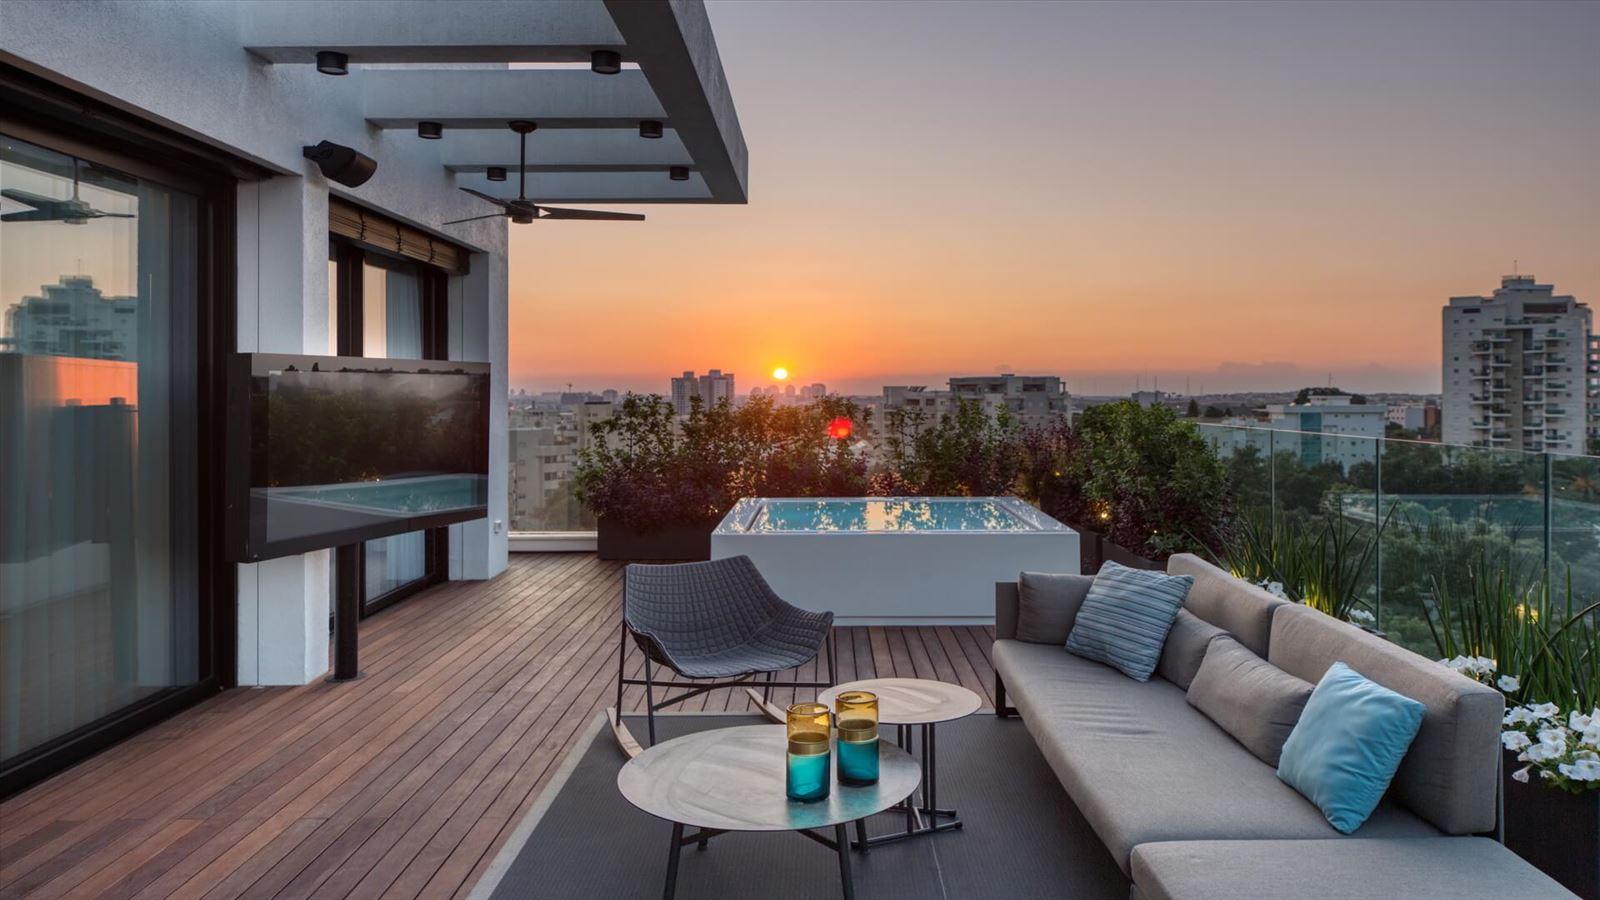 Penthouse Carmelit - תאורה מעוצבת במרפסת על ידי דורי קמחי